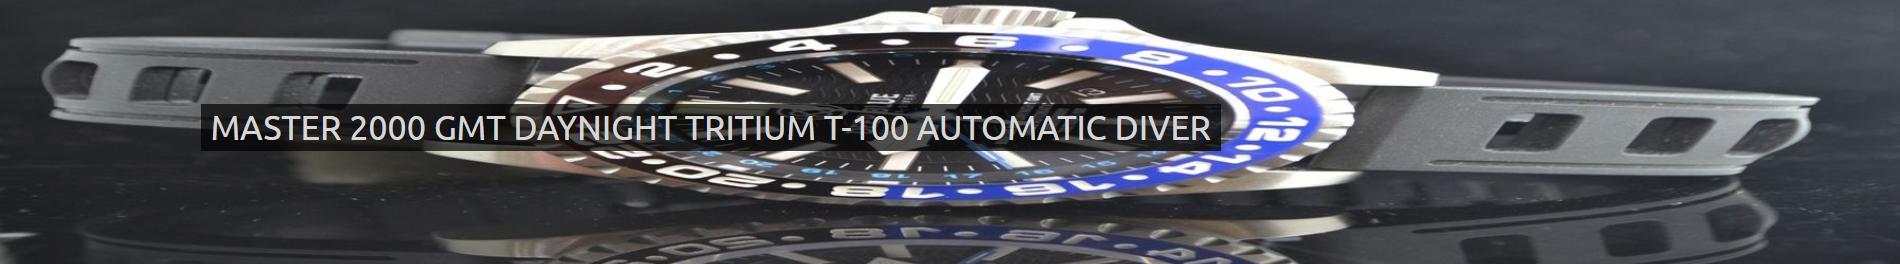 MASTER-2000-GMT-DAYNIGHT-TRITIUM-T-100-AUTOMATIC-DIVER